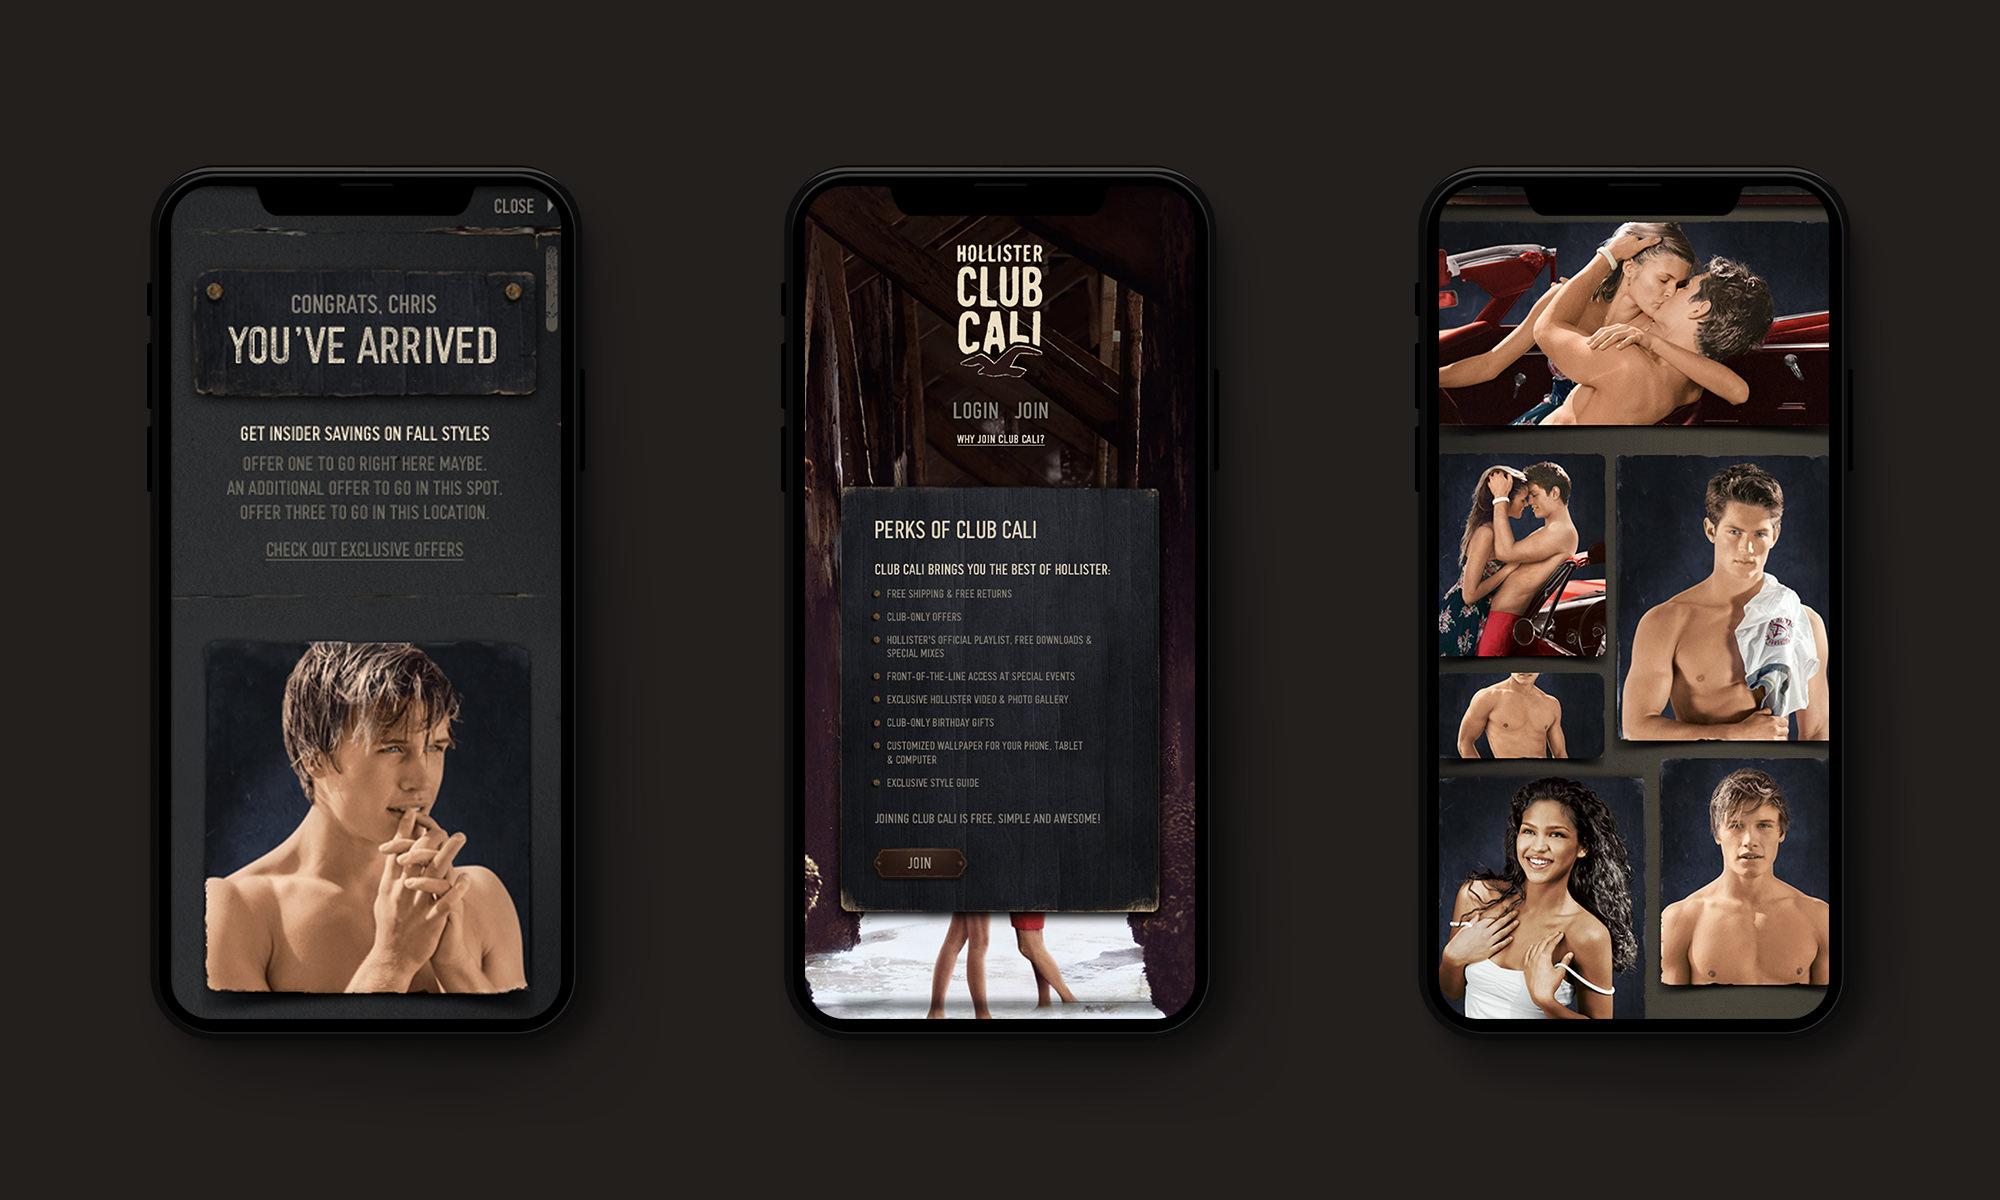 club-cali-sign-in-gallery-mobile.jpg